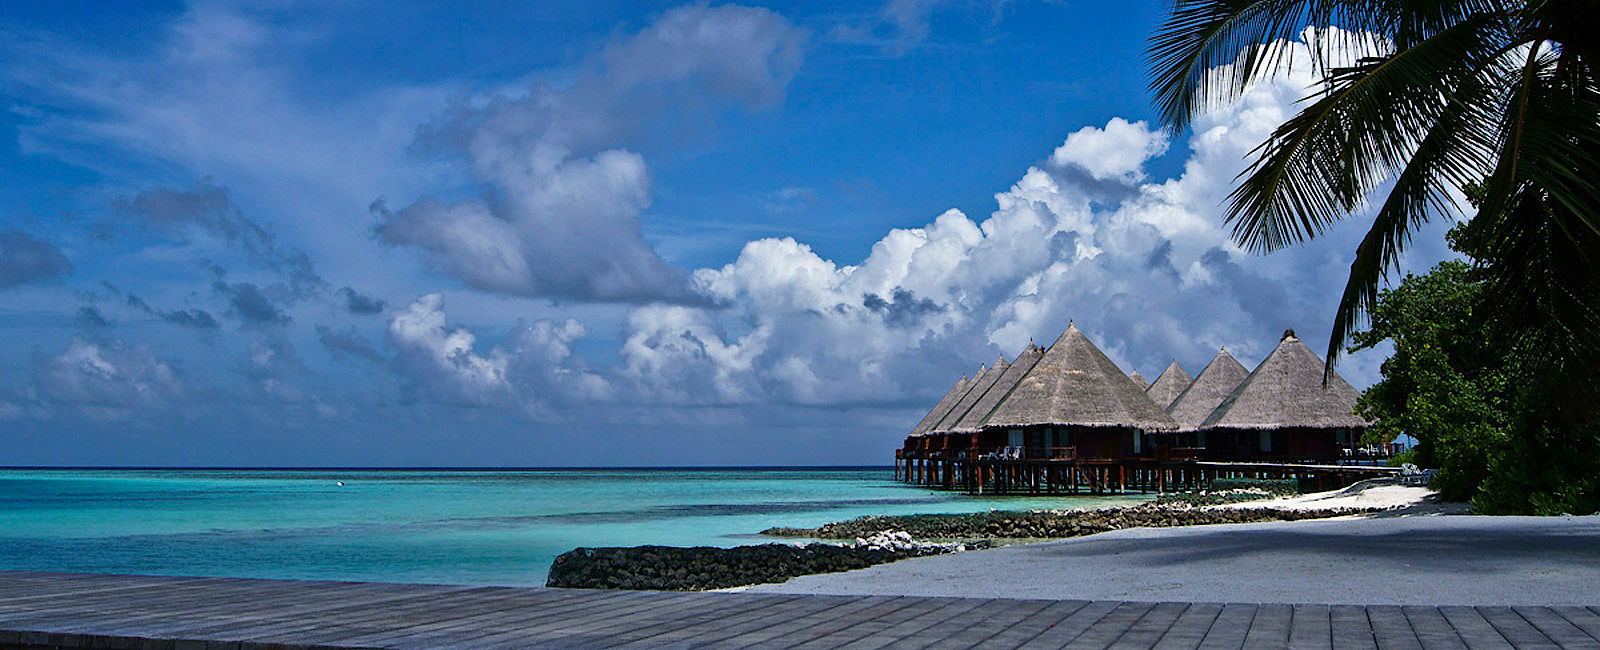 malediven connoisseur circle destinationen im check. Black Bedroom Furniture Sets. Home Design Ideas